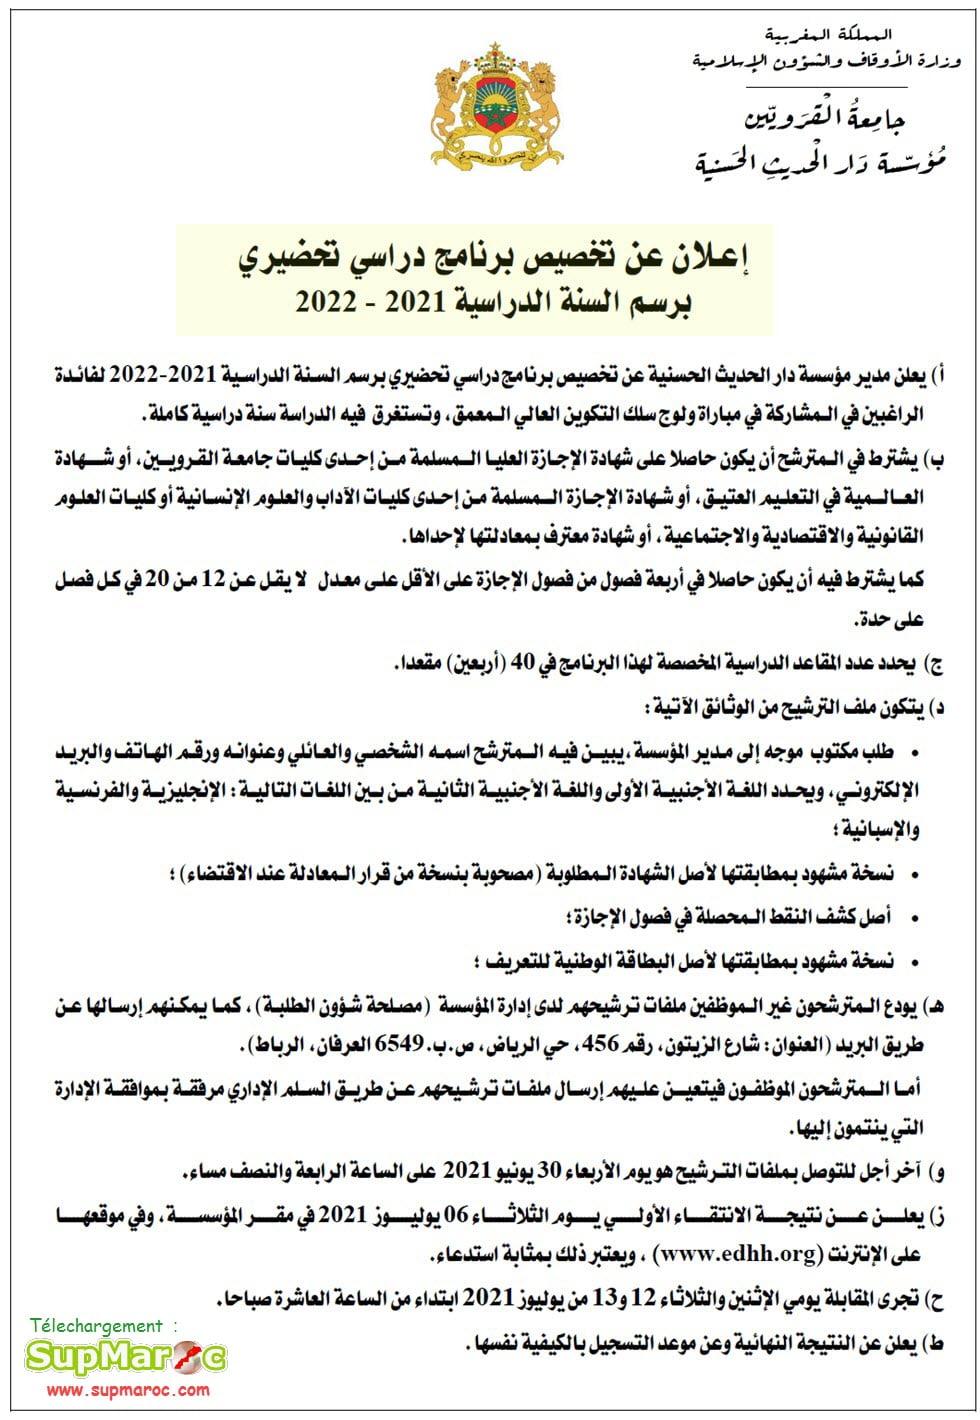 Dar Al Hadith AL Hassania concours formation supérieure 2021 دار الحديث الحسنية إعلان عن تخصيص برنامج دراسي تحضيري (السلك العالي المعمق)